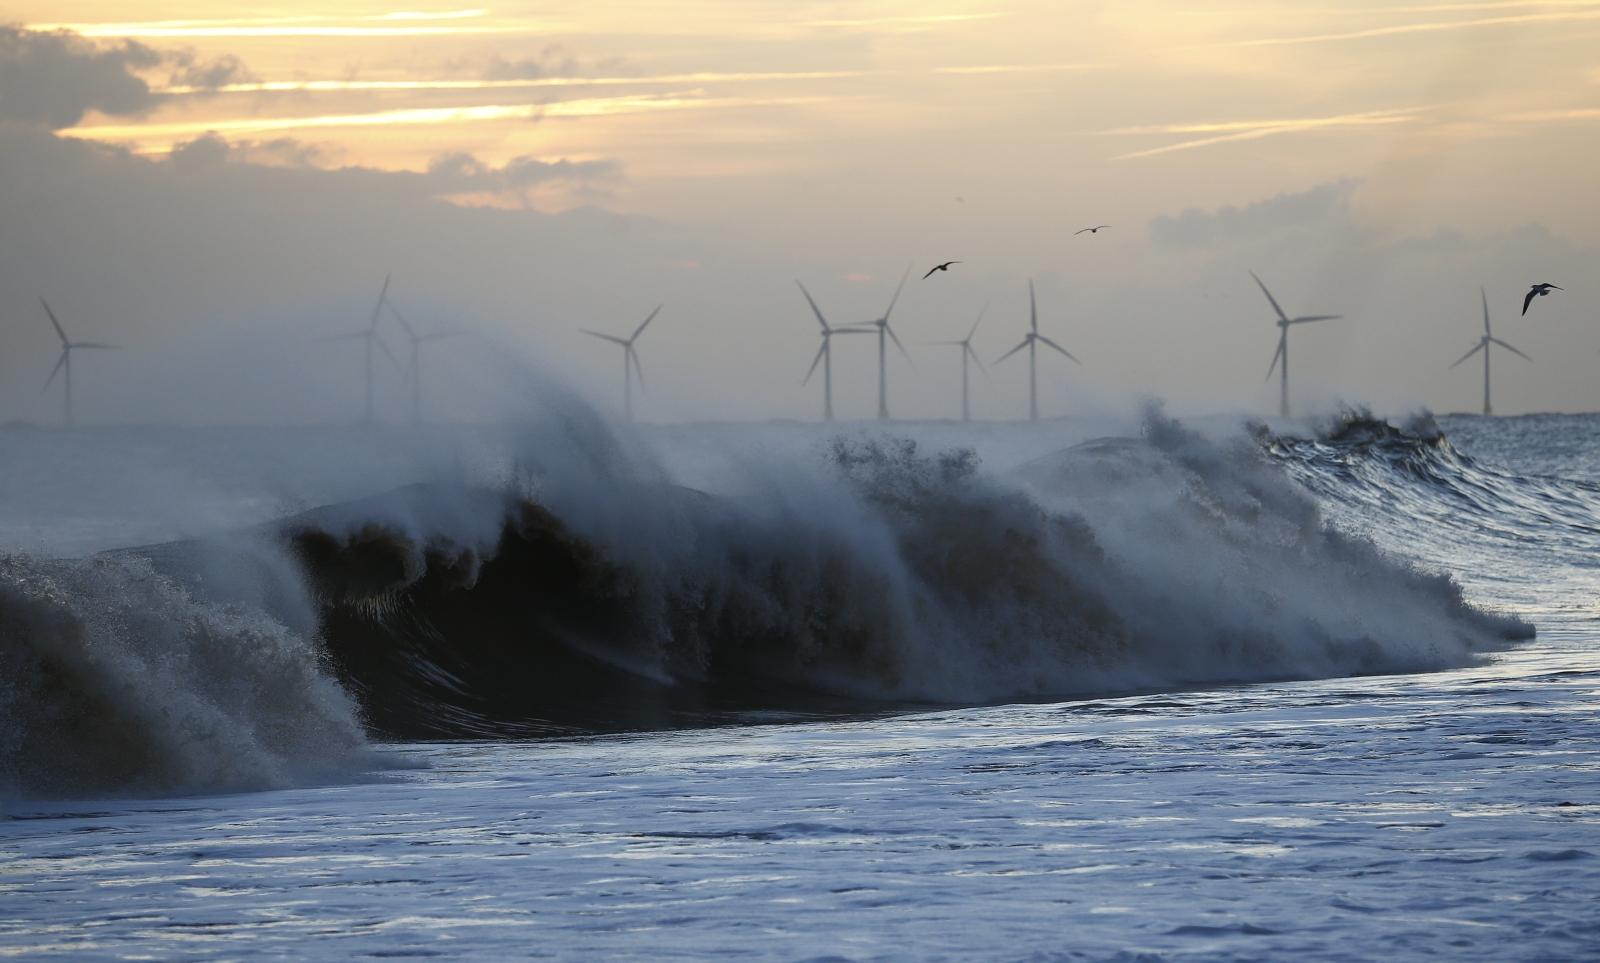 Hurricane Gonzalo: 100mph Gale Force Winds Batter Britain